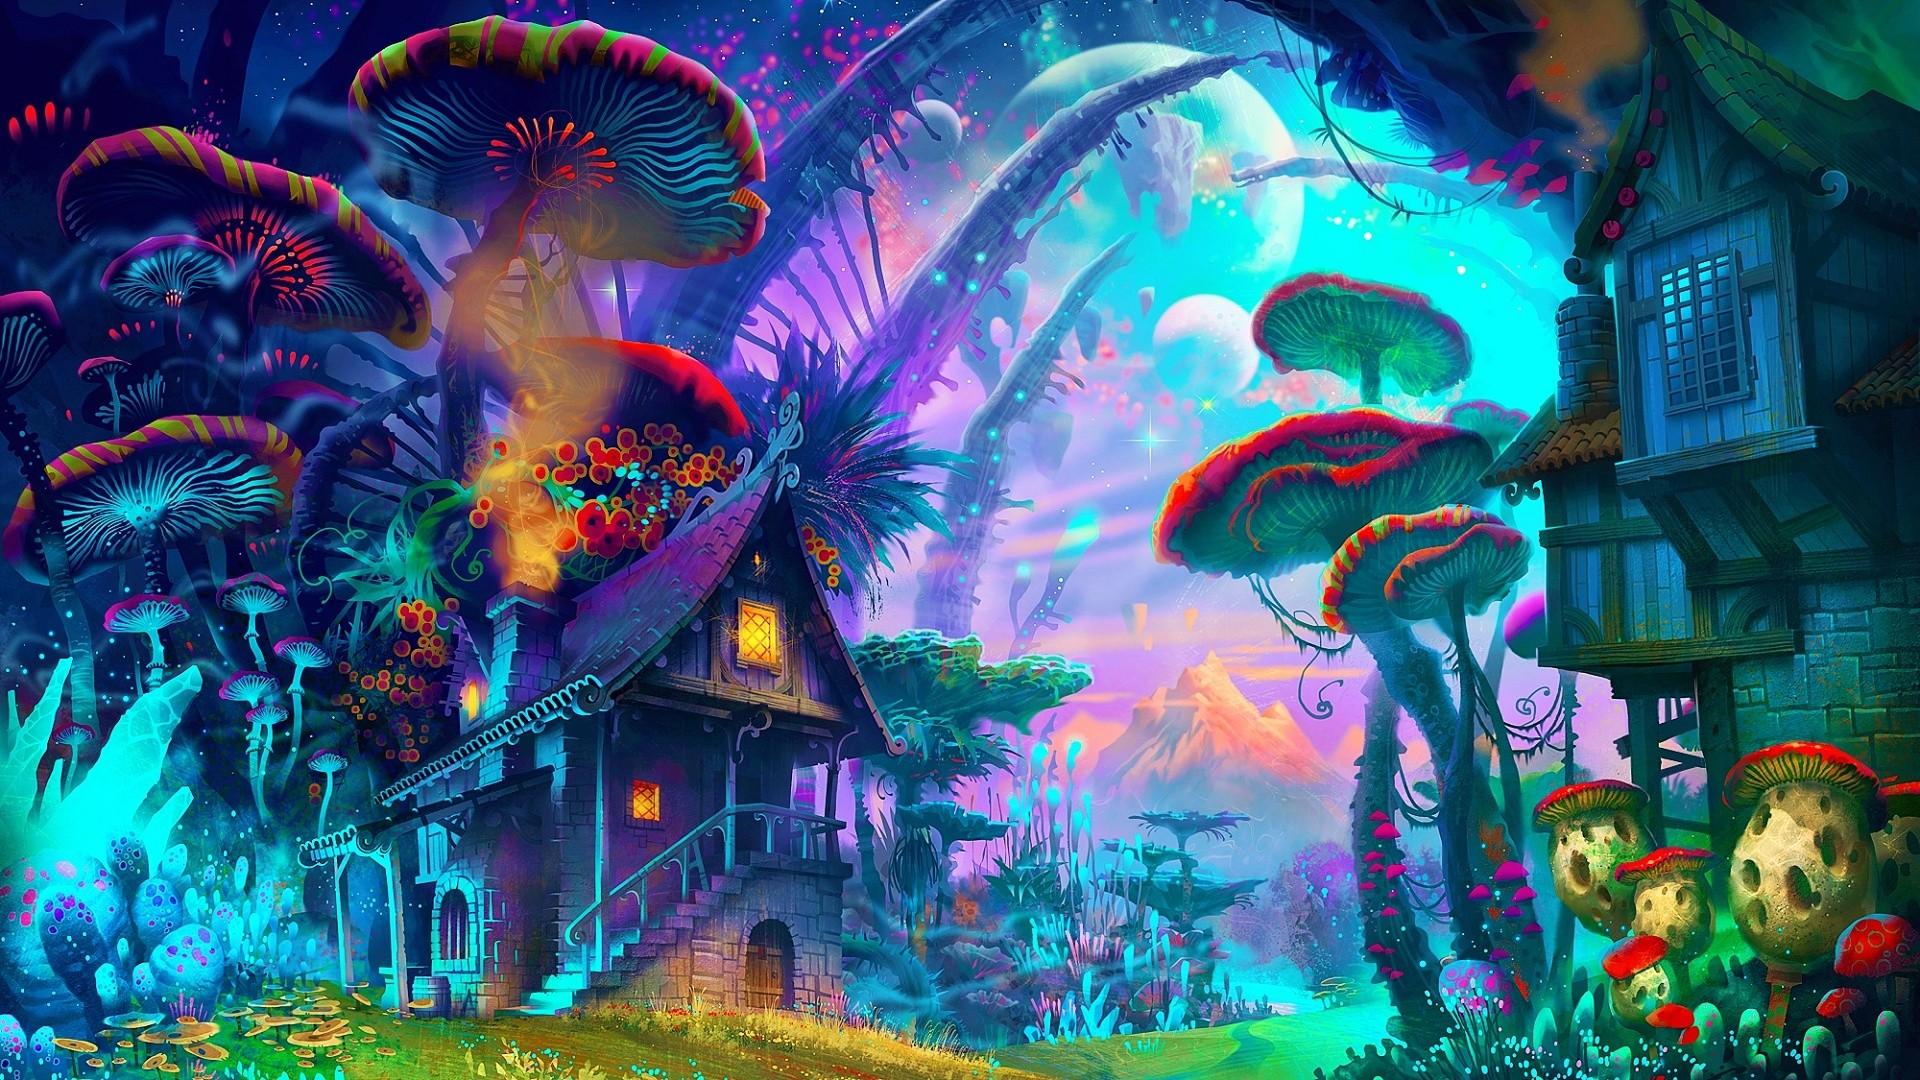 Mushroom Psychedelic Wallpaper